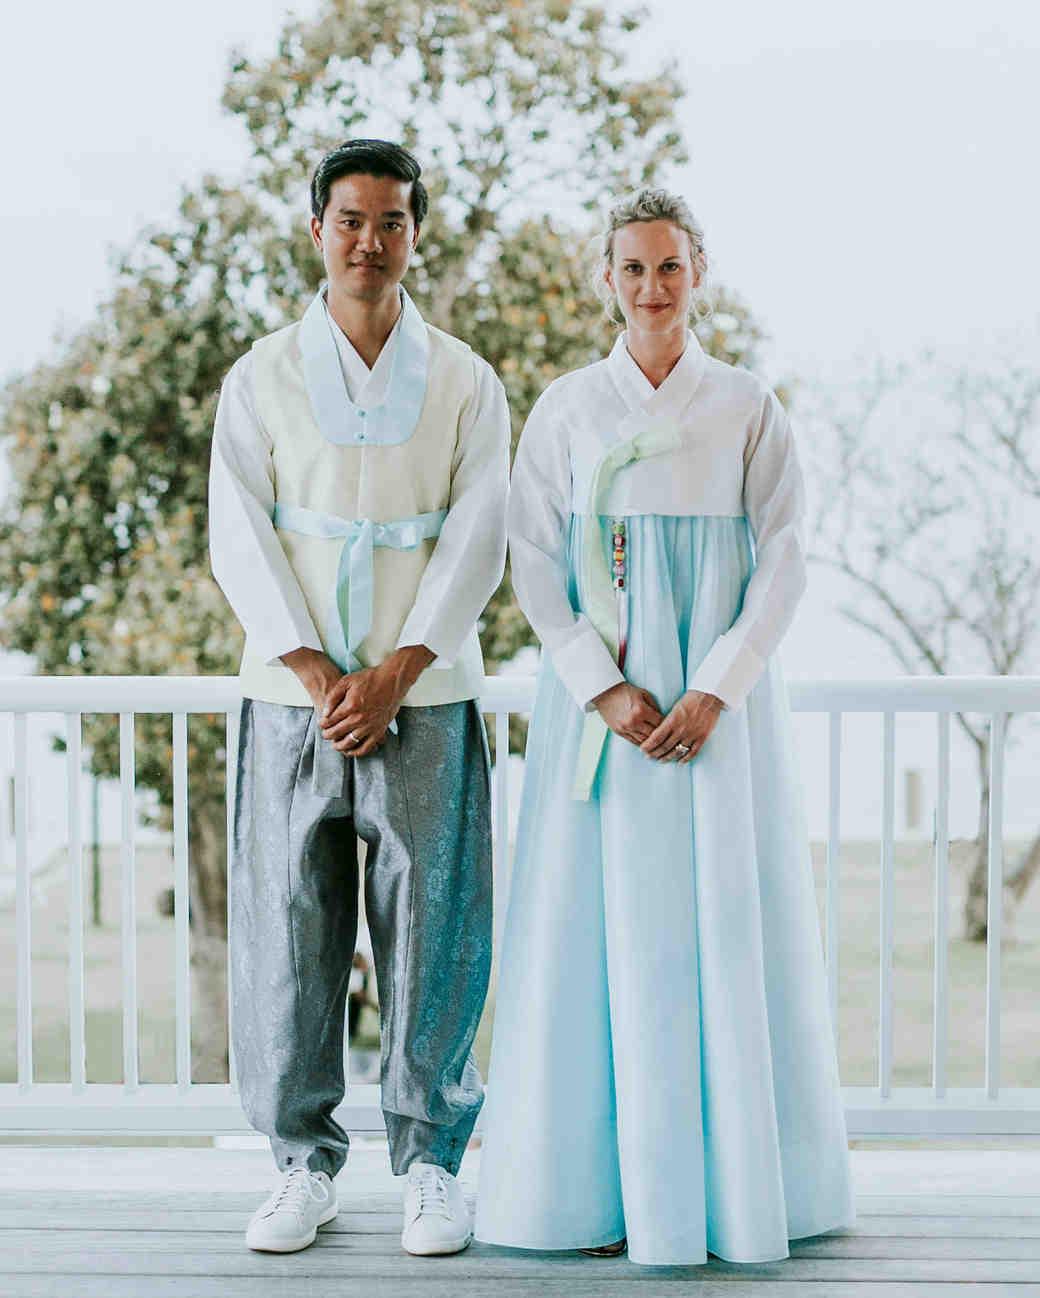 leah michael wedding couple hanbok